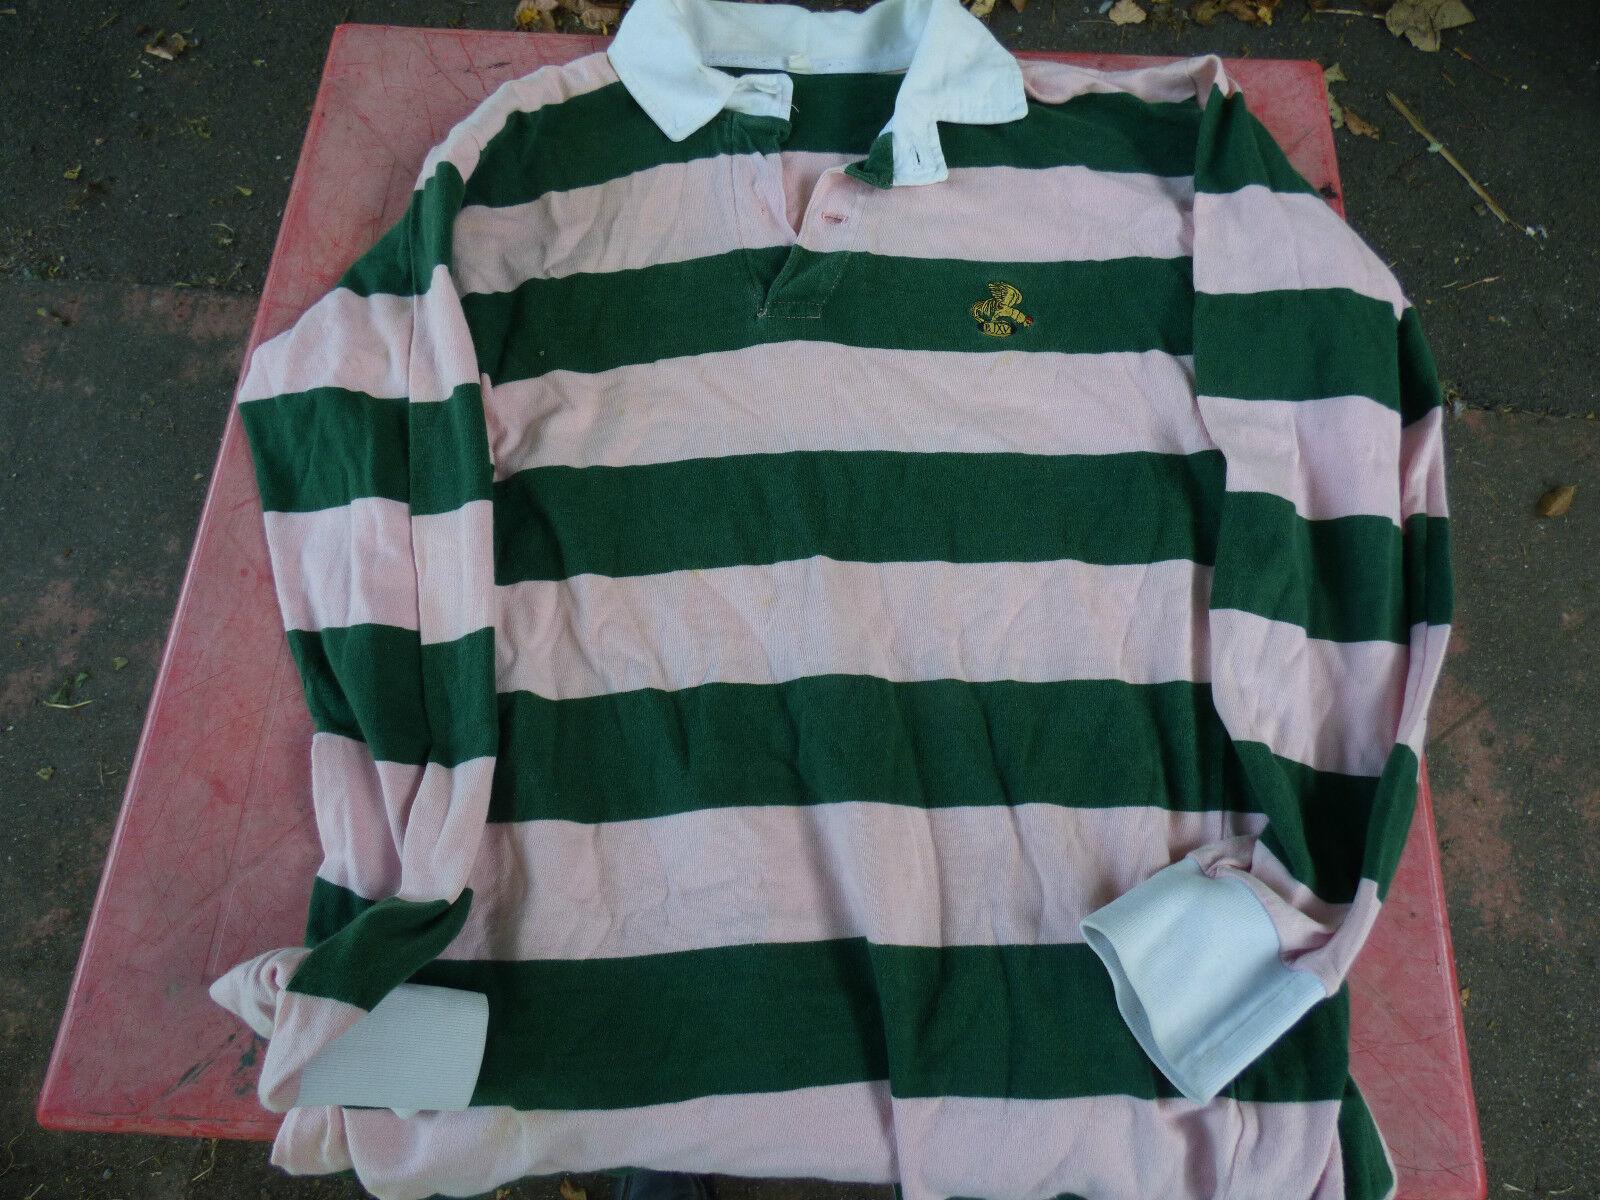 Polo de rugby Vintage Batallón Joinville verde y se levantó raro 69cm sur 54cm